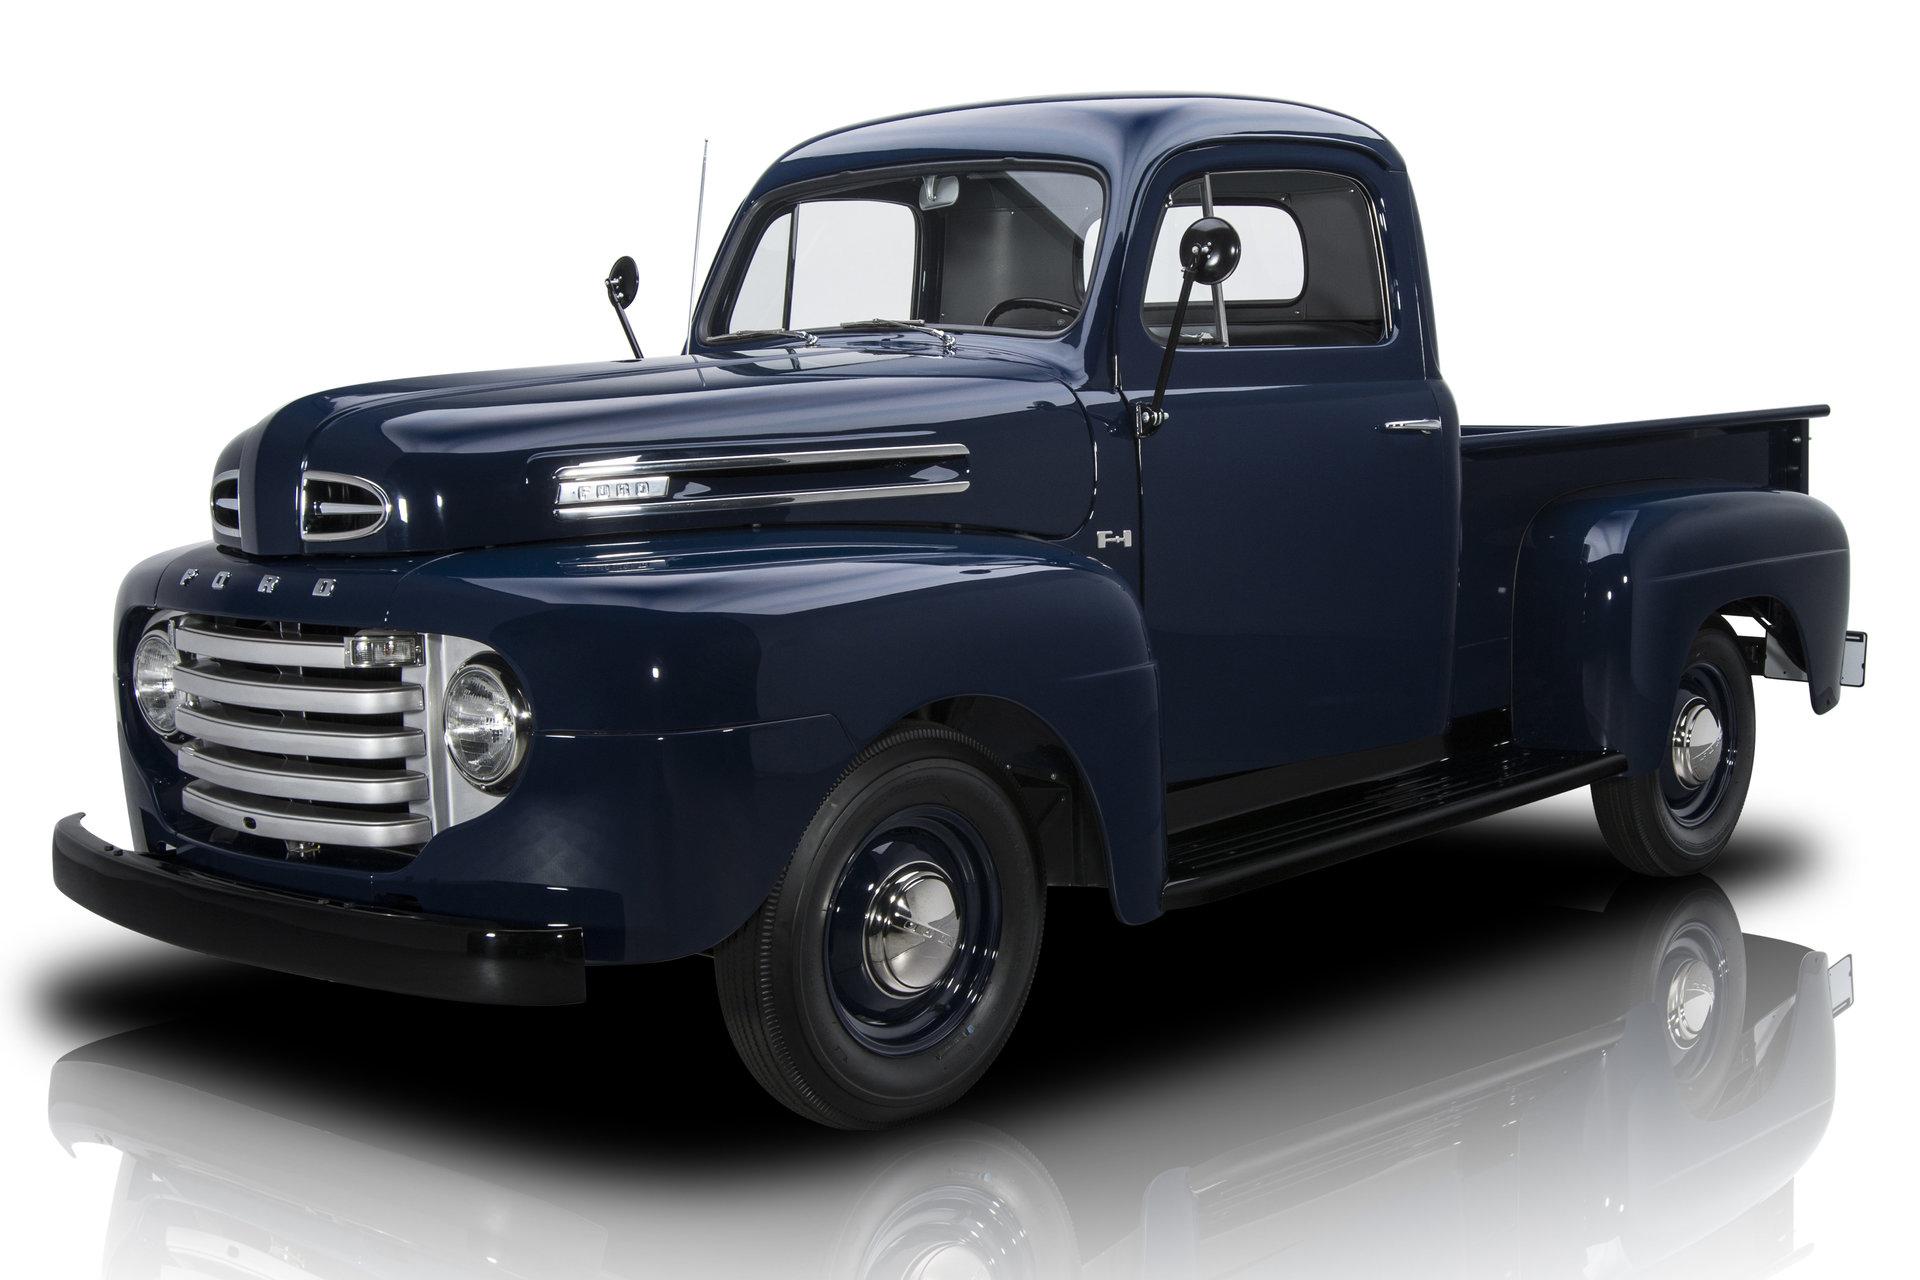 1950 ford f1 pickup truck for sale 79015 mcg. Black Bedroom Furniture Sets. Home Design Ideas